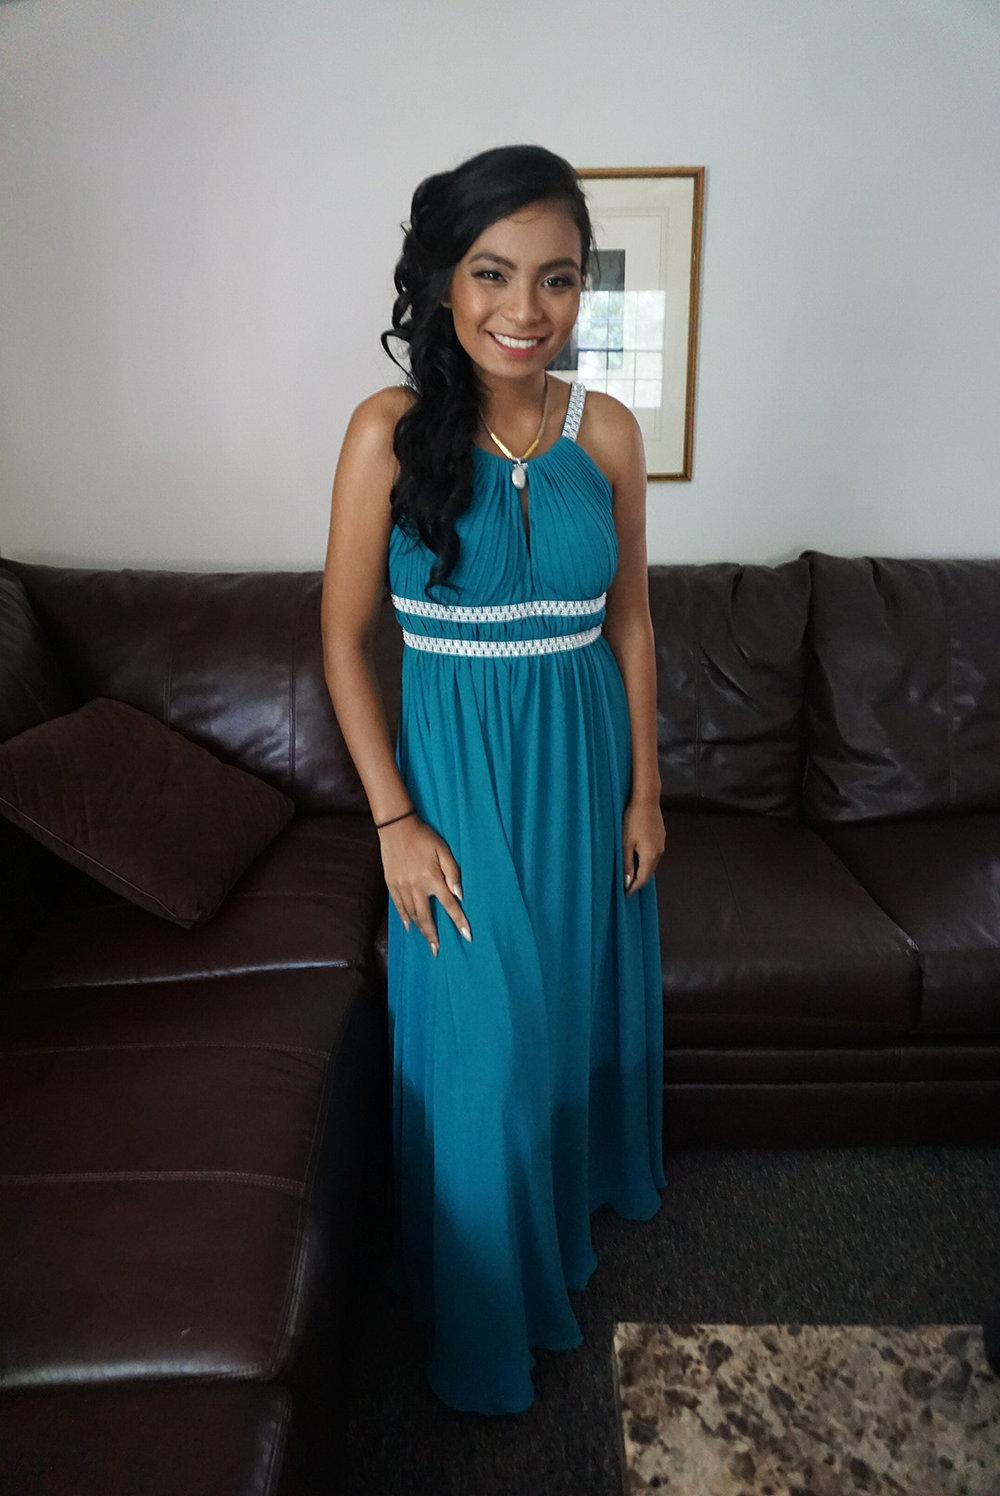 Teal-Bridesmaid-Dress-Summer-Style-Blogger-LINDATENCHITRAN-4-1616x1080.jpg